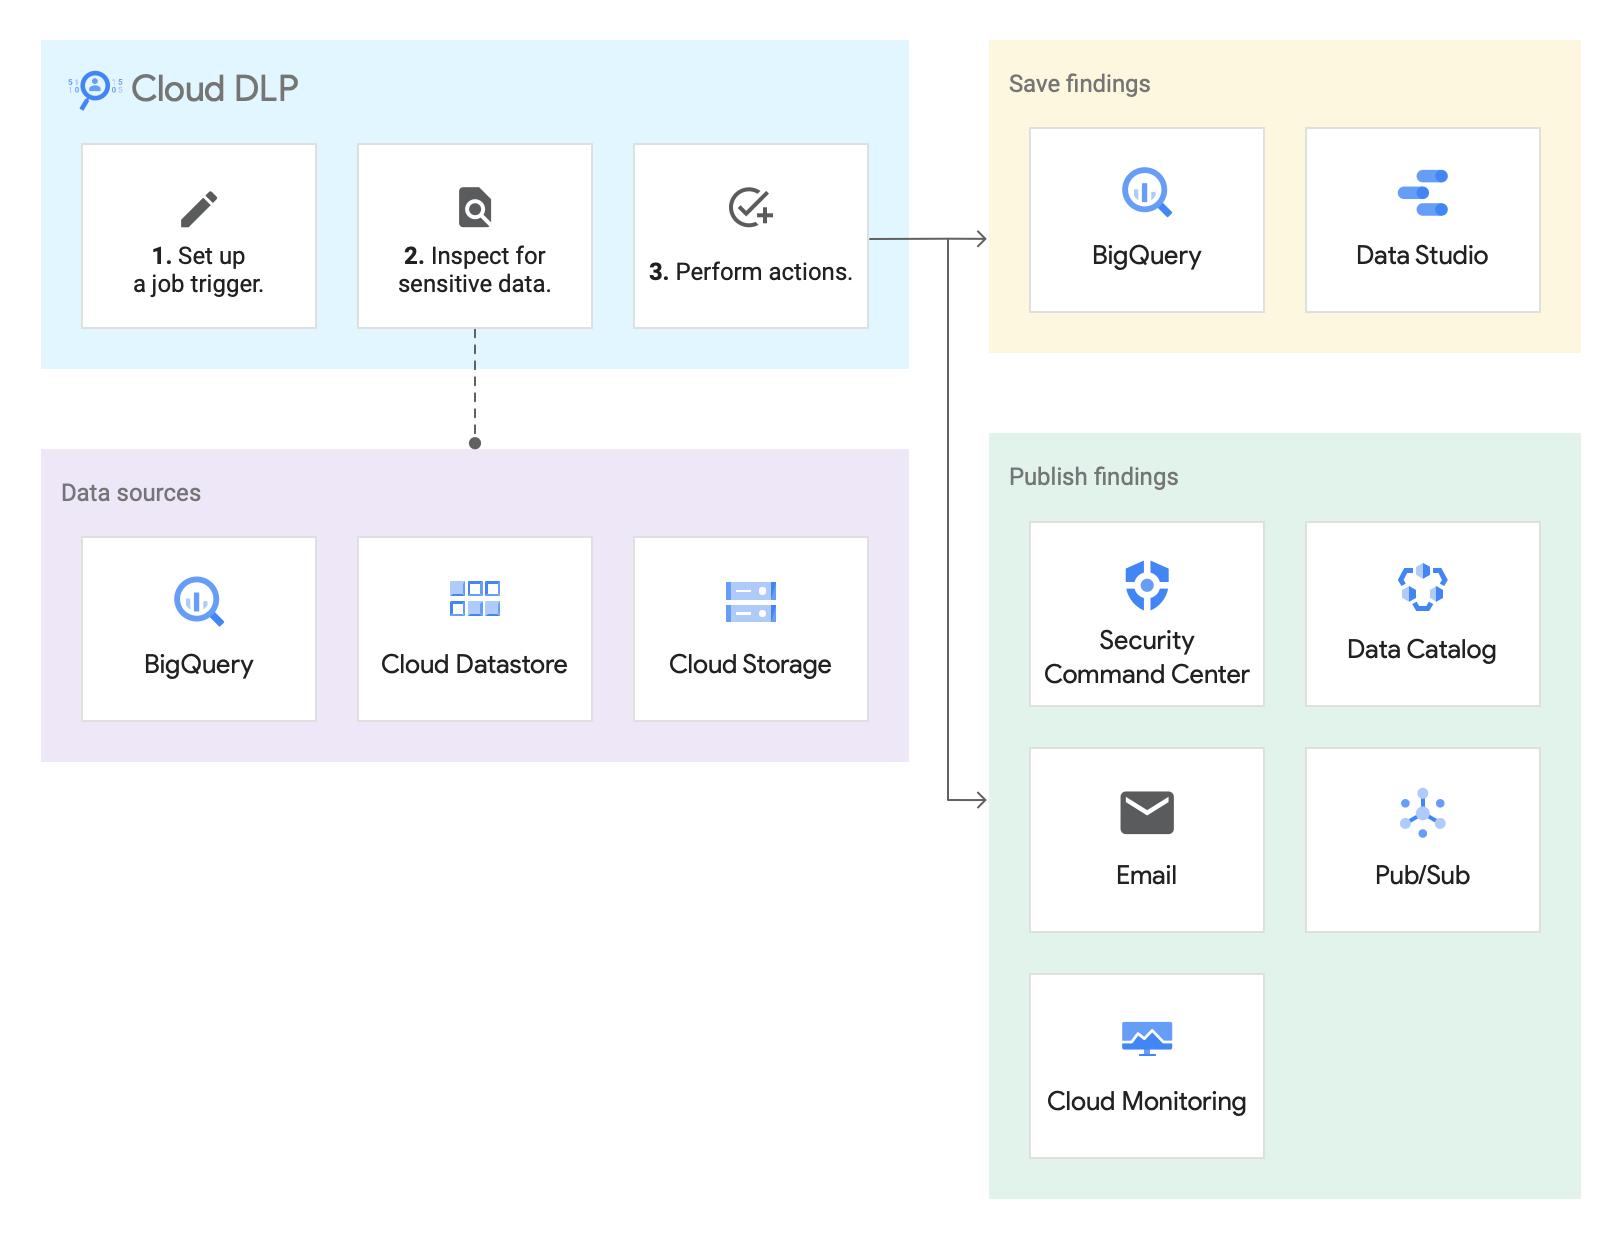 Diagrama do fluxo de dados de métodos de armazenamento mostrando o Cloud DLP inspecionando dados em um repositório de armazenamento do Google Cloud e salvando ou publicando descobertas.